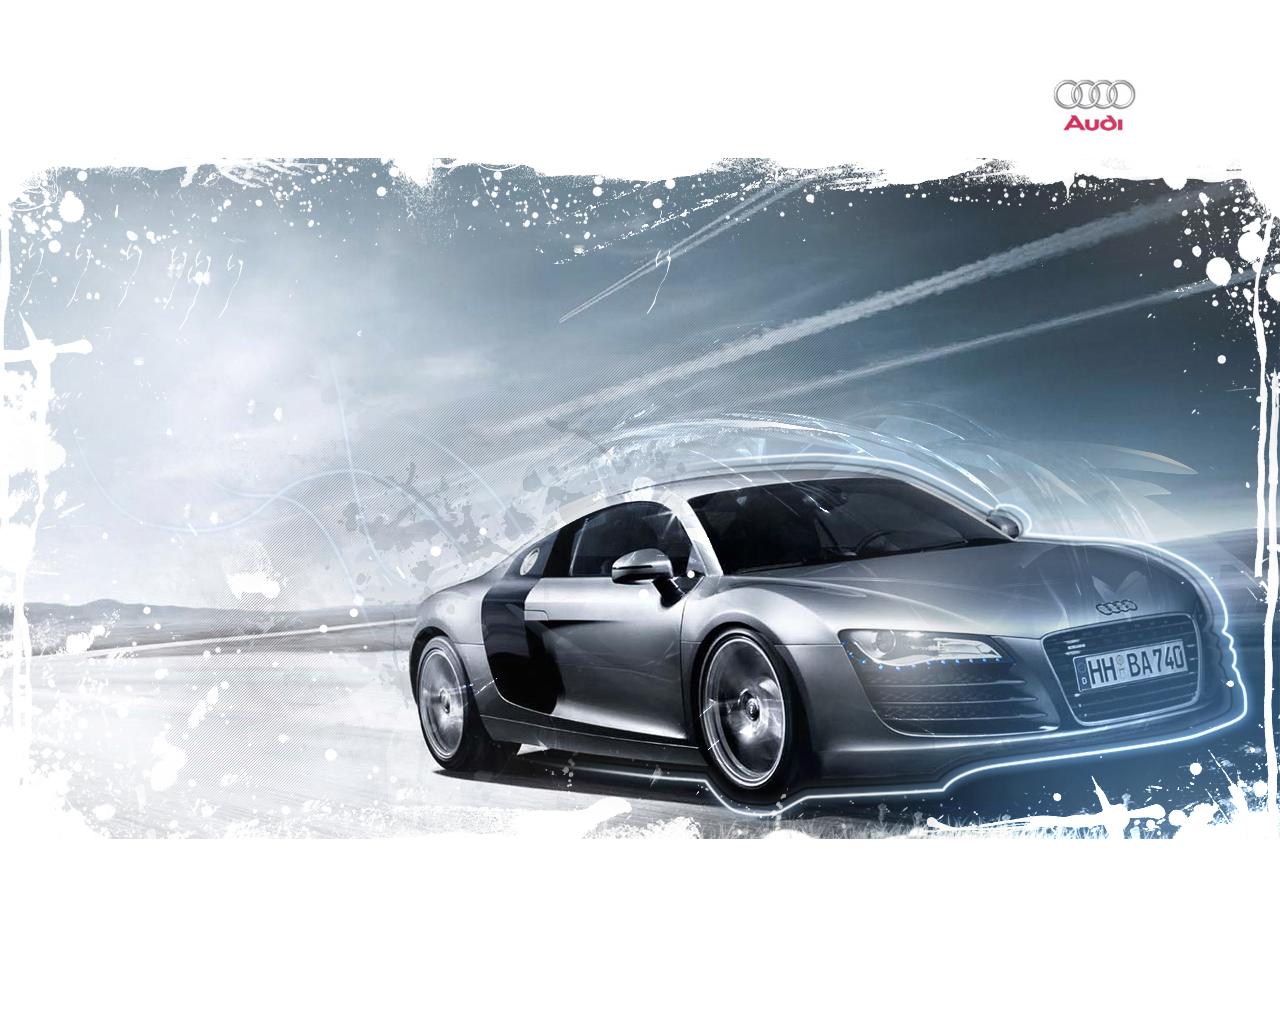 Audi wallpaper by j o r d y-1-